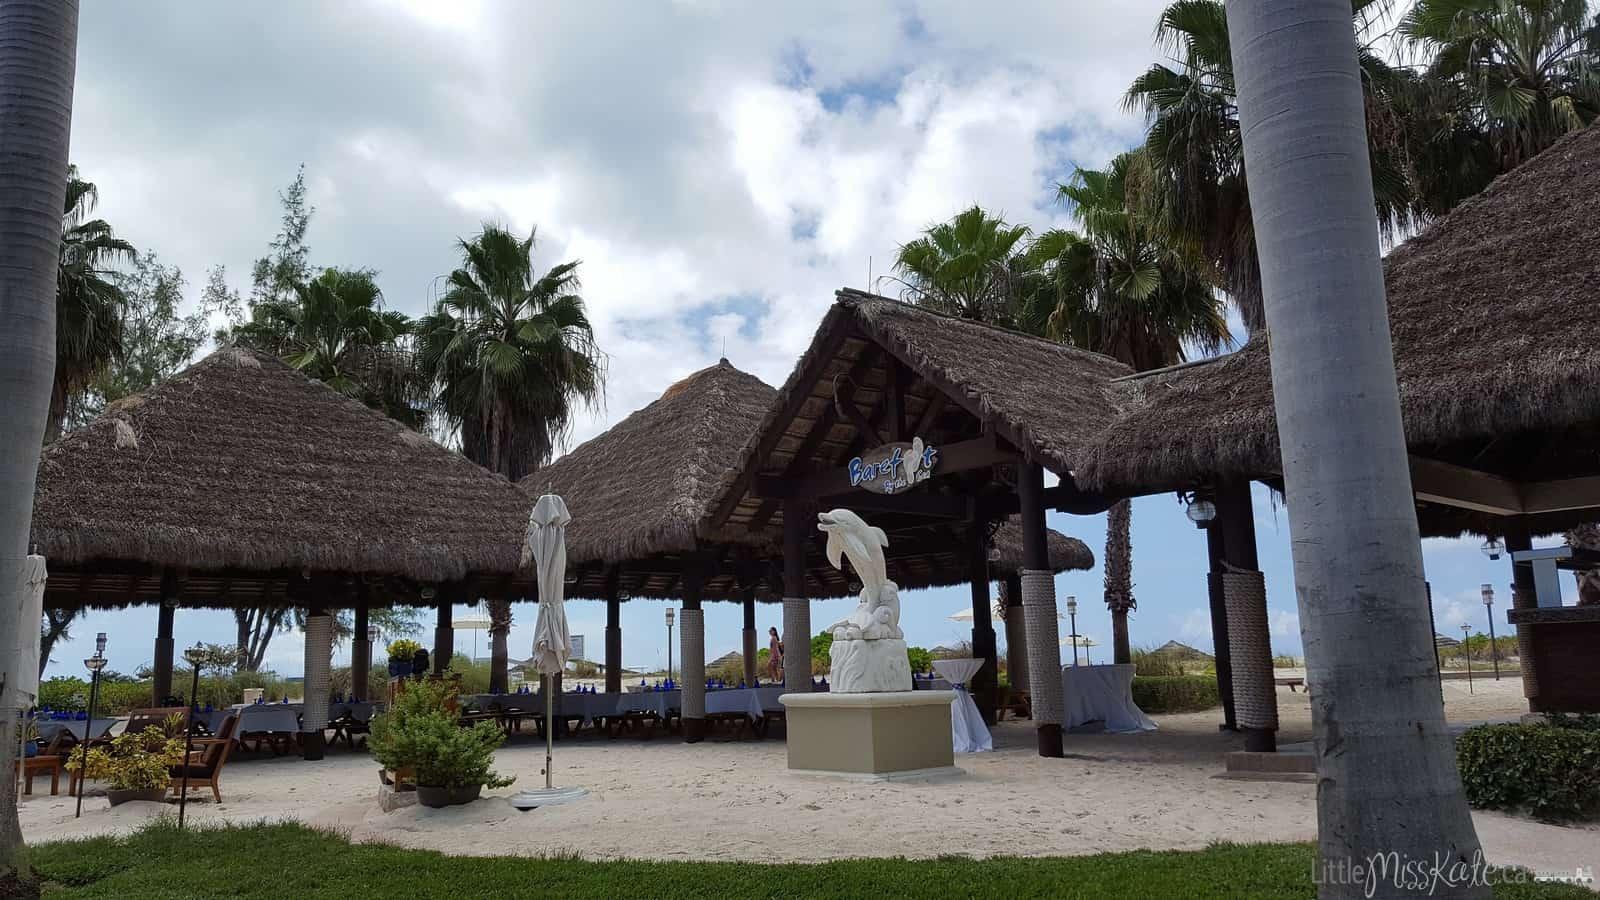 Beaches Resort Villages Turks and Caicos Restaurants - Barefoot by the sea via littlemisskate.ca